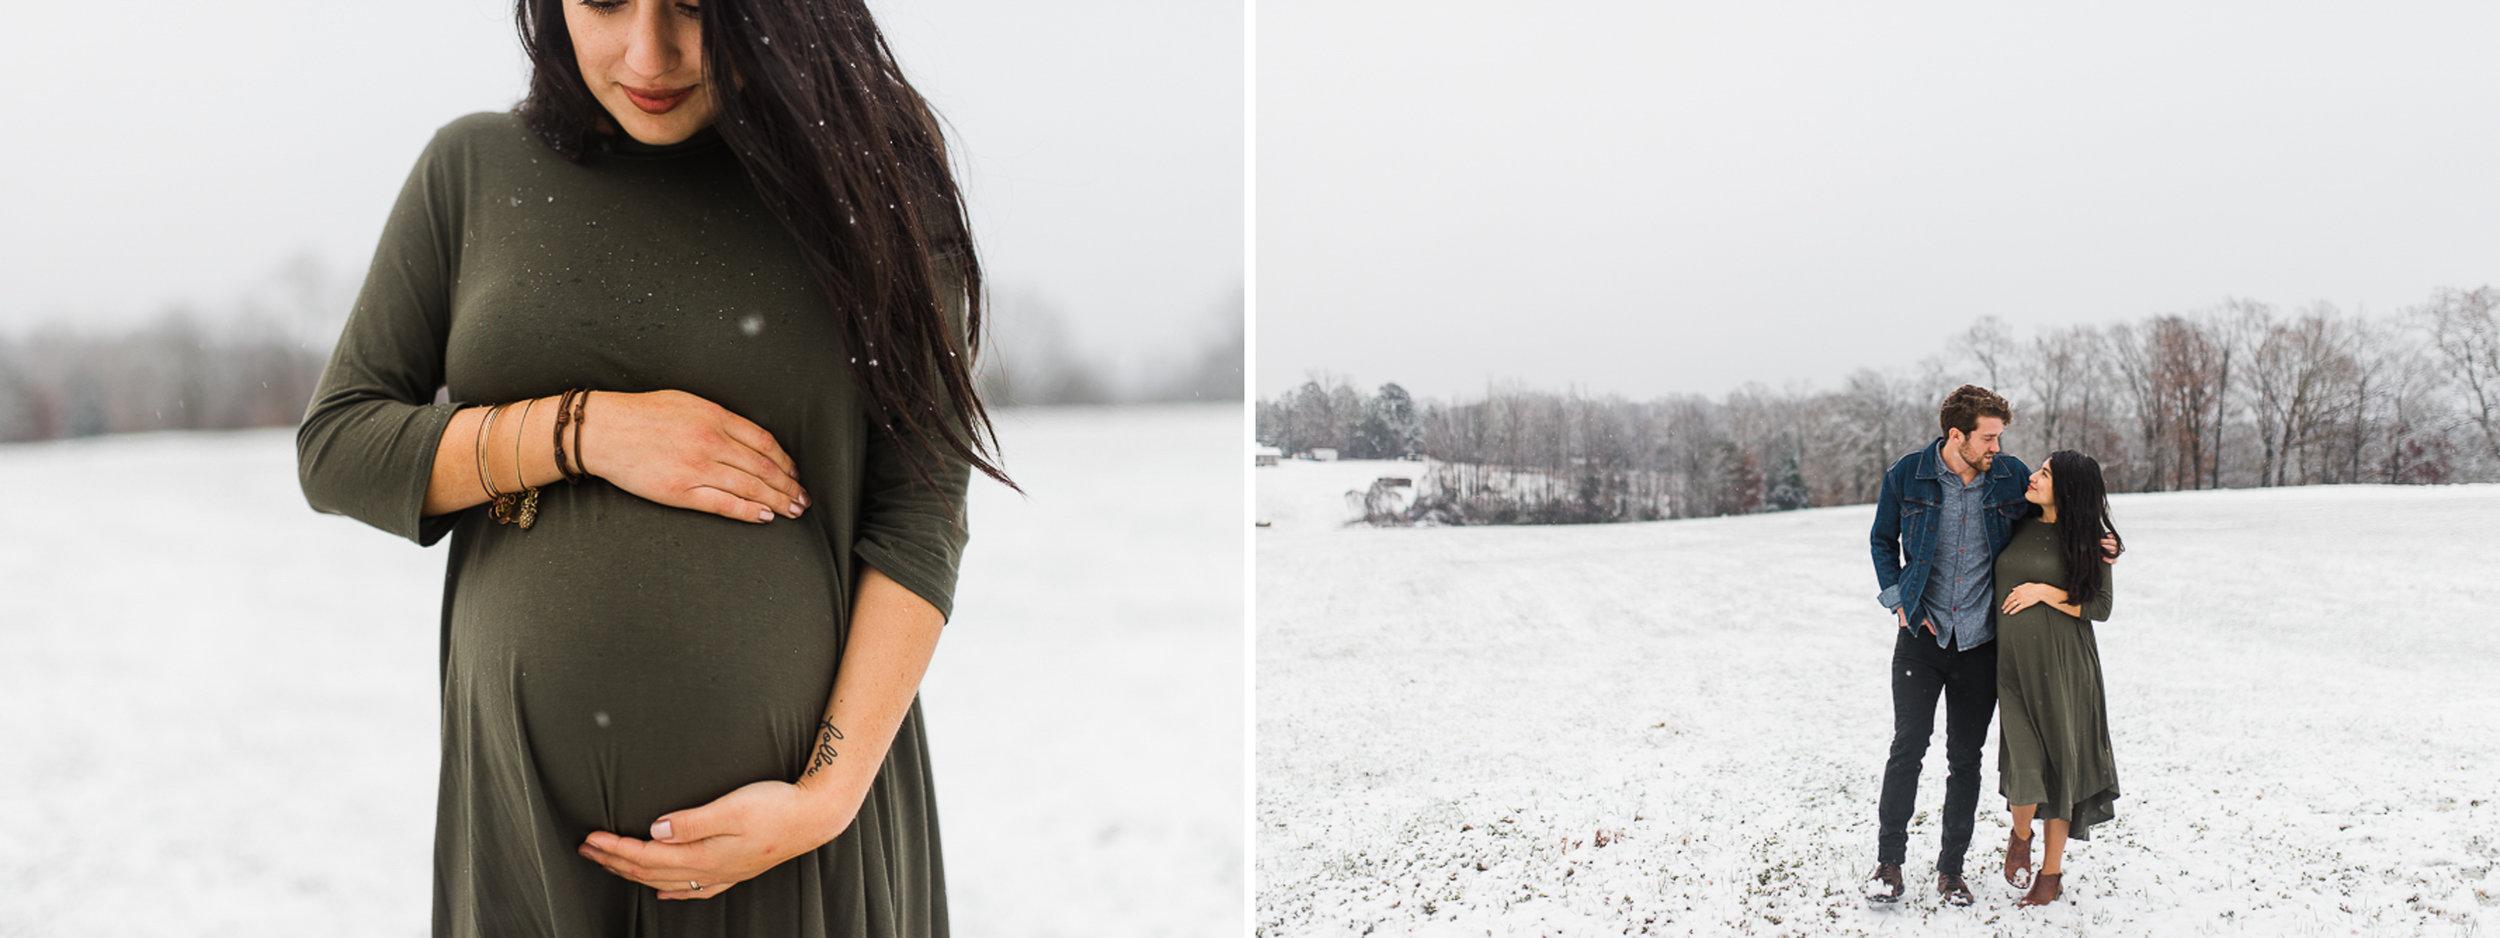 Snow, Winter, Baby Bump, Maternity, Photo 11-1.jpg